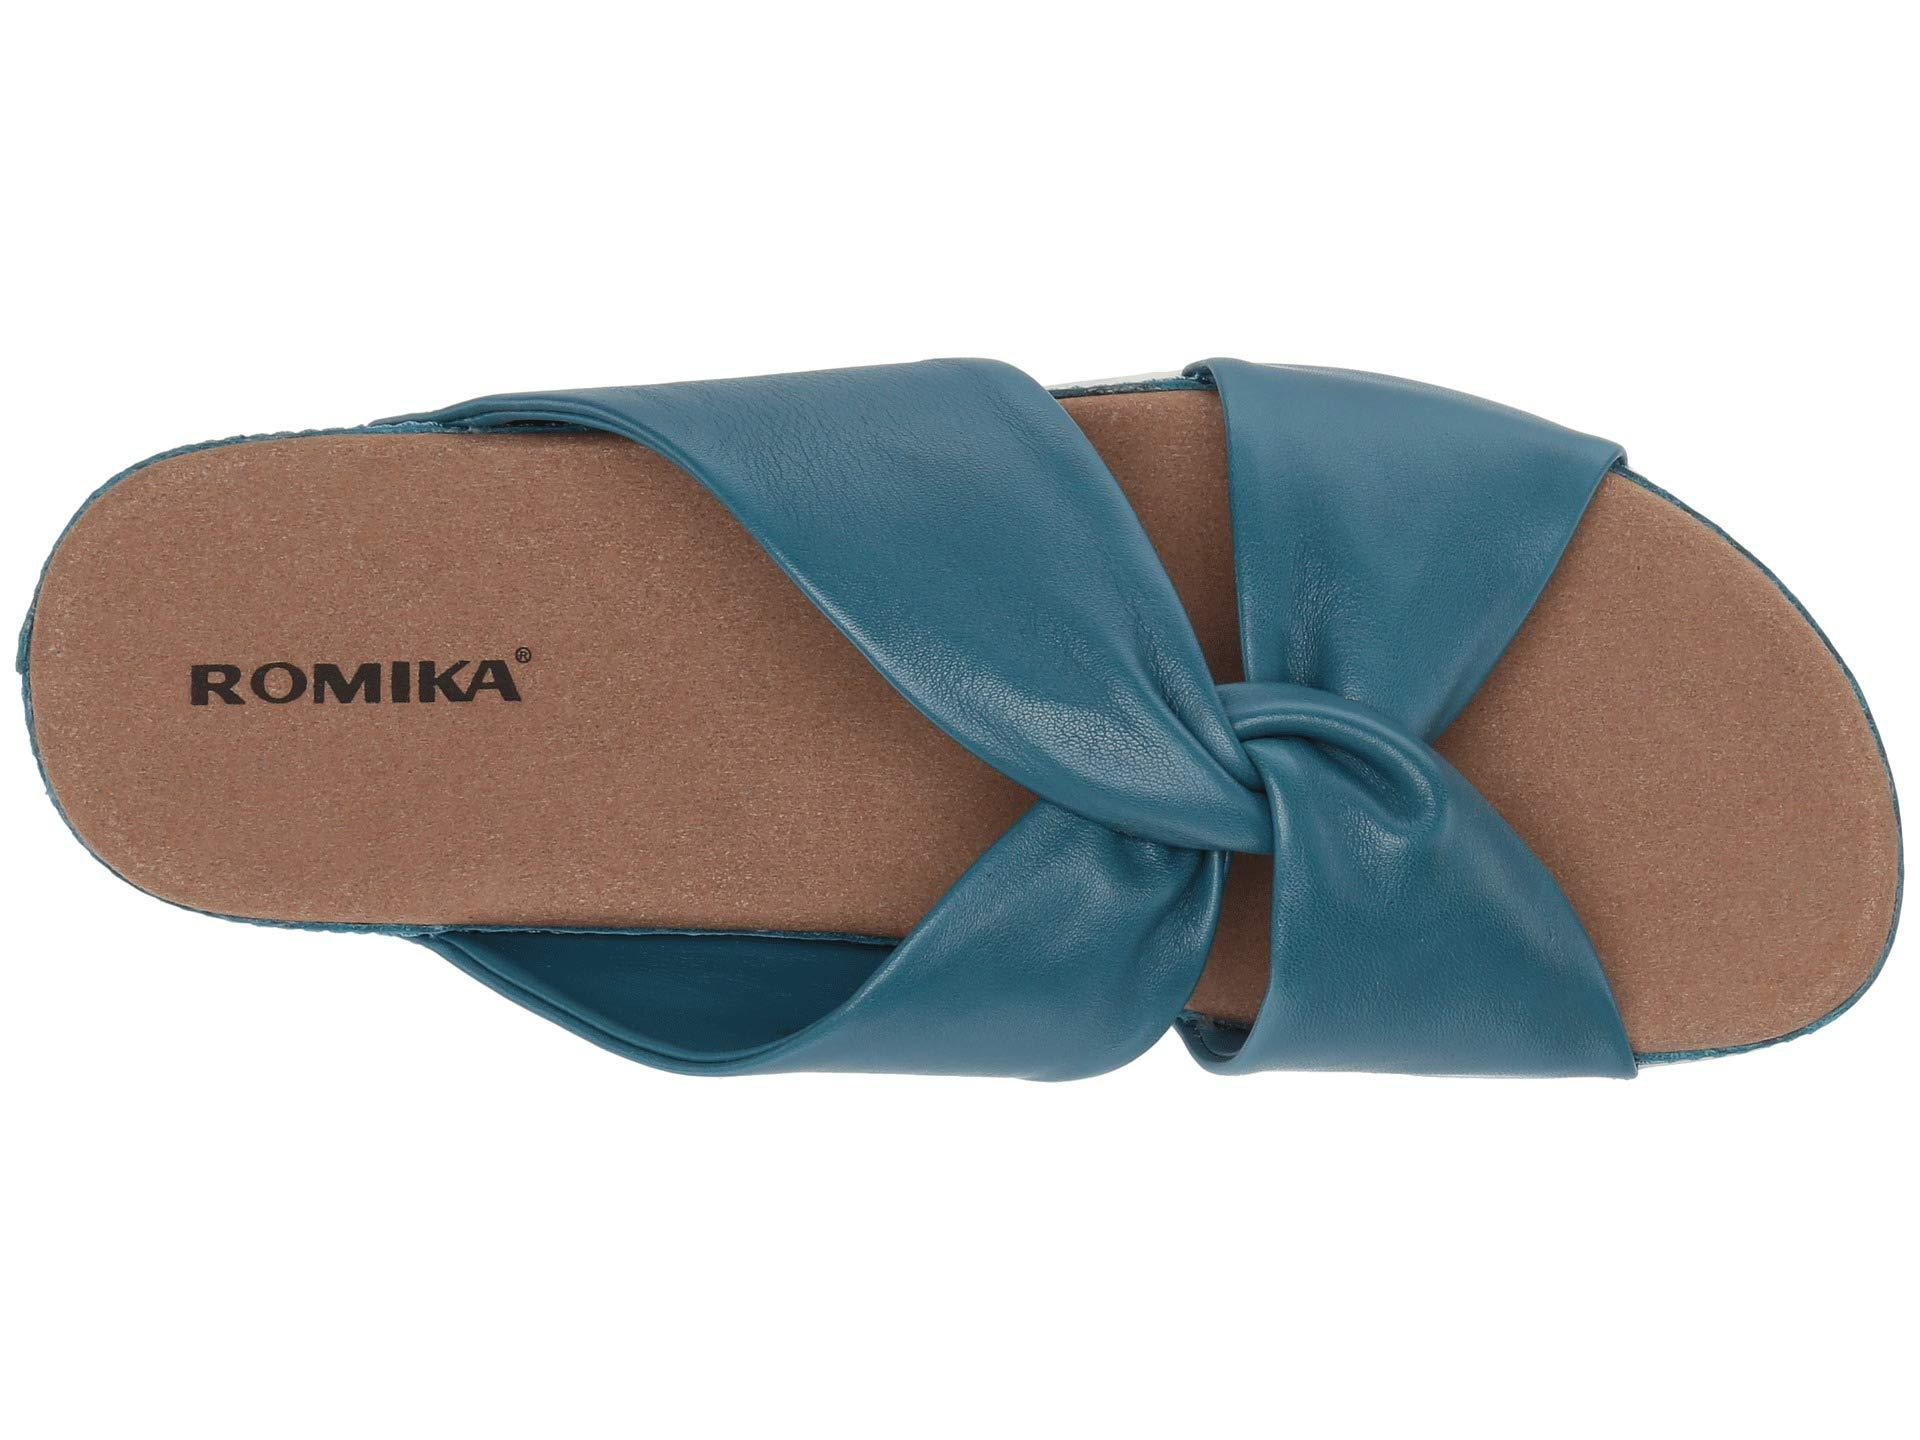 0c8815c3c71c Romika - Blue Florenz 10 (black) Women s Slide Shoes - Lyst. View fullscreen